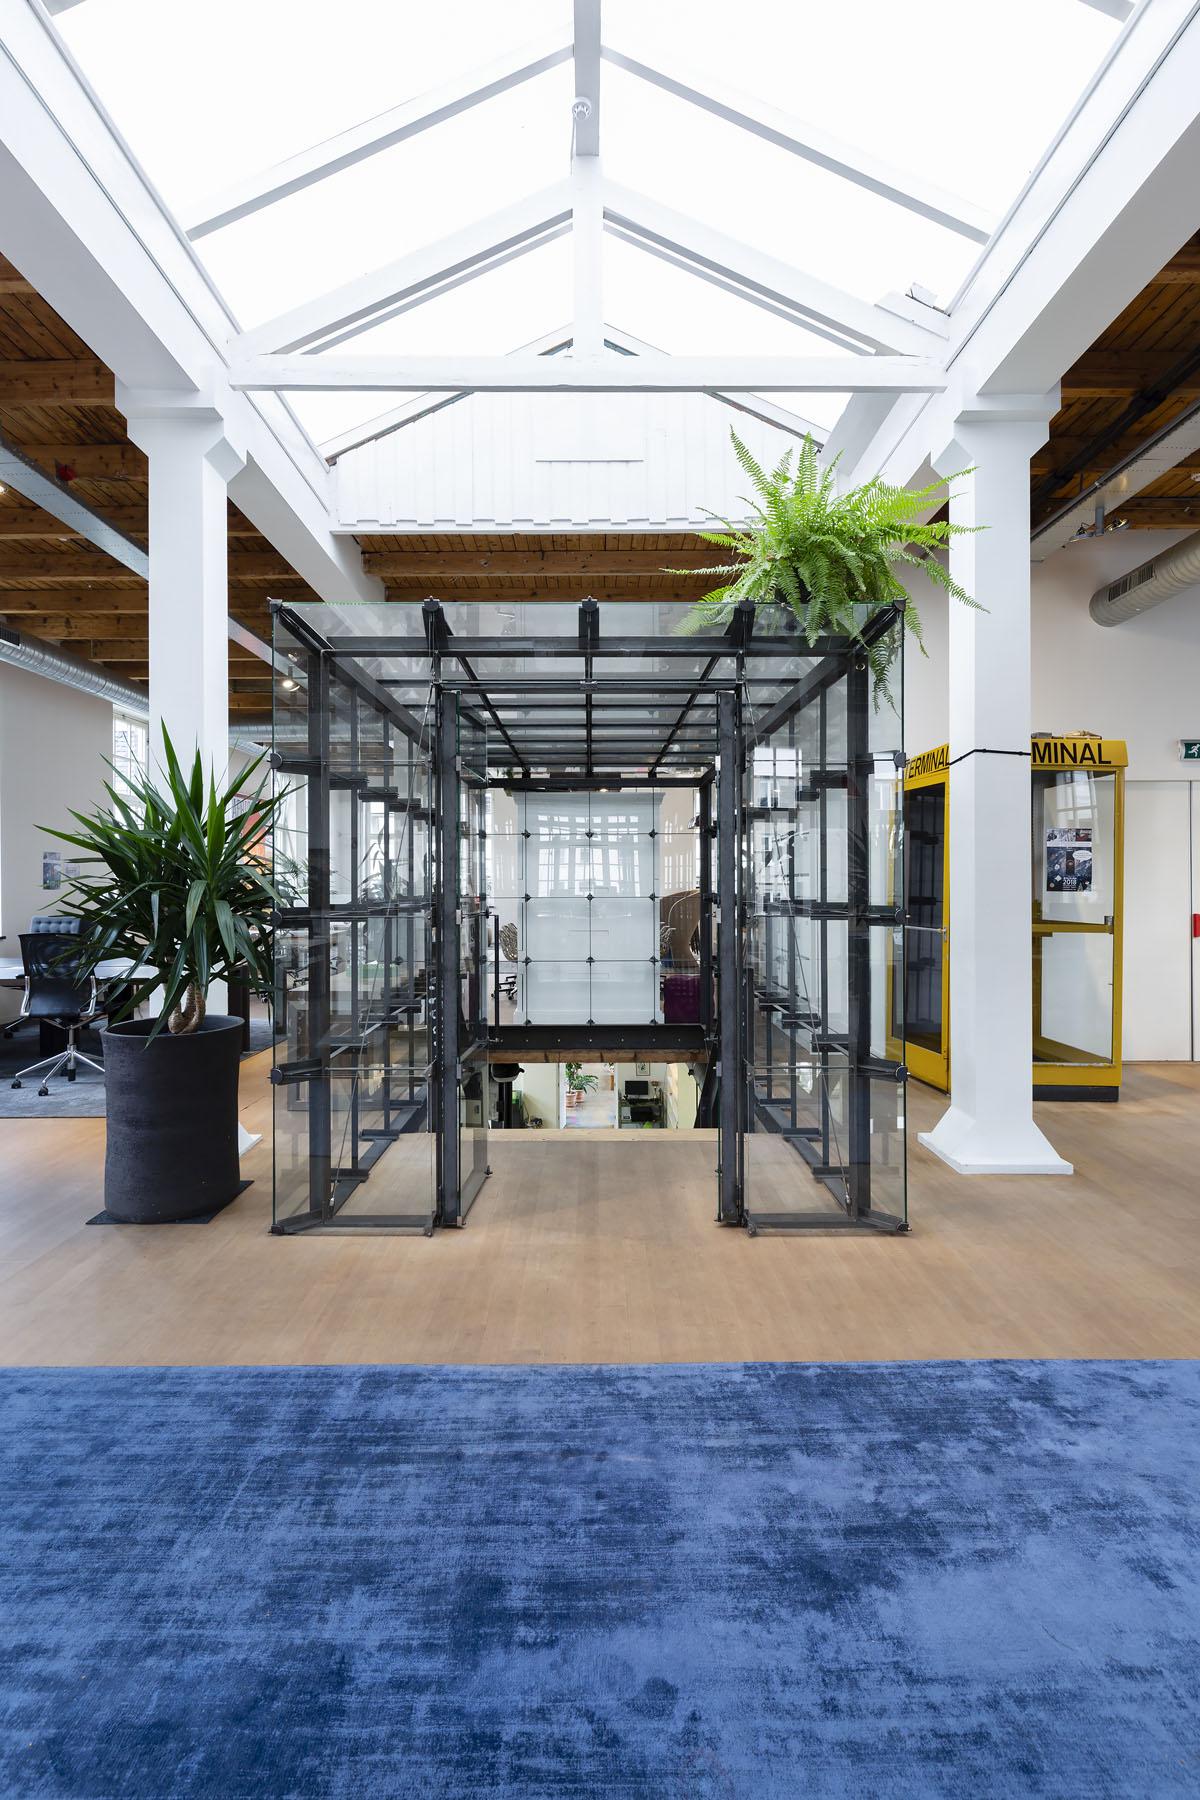 Freedom-Lab-Amsterdam-Jeroen-Machielsen-30.jpg